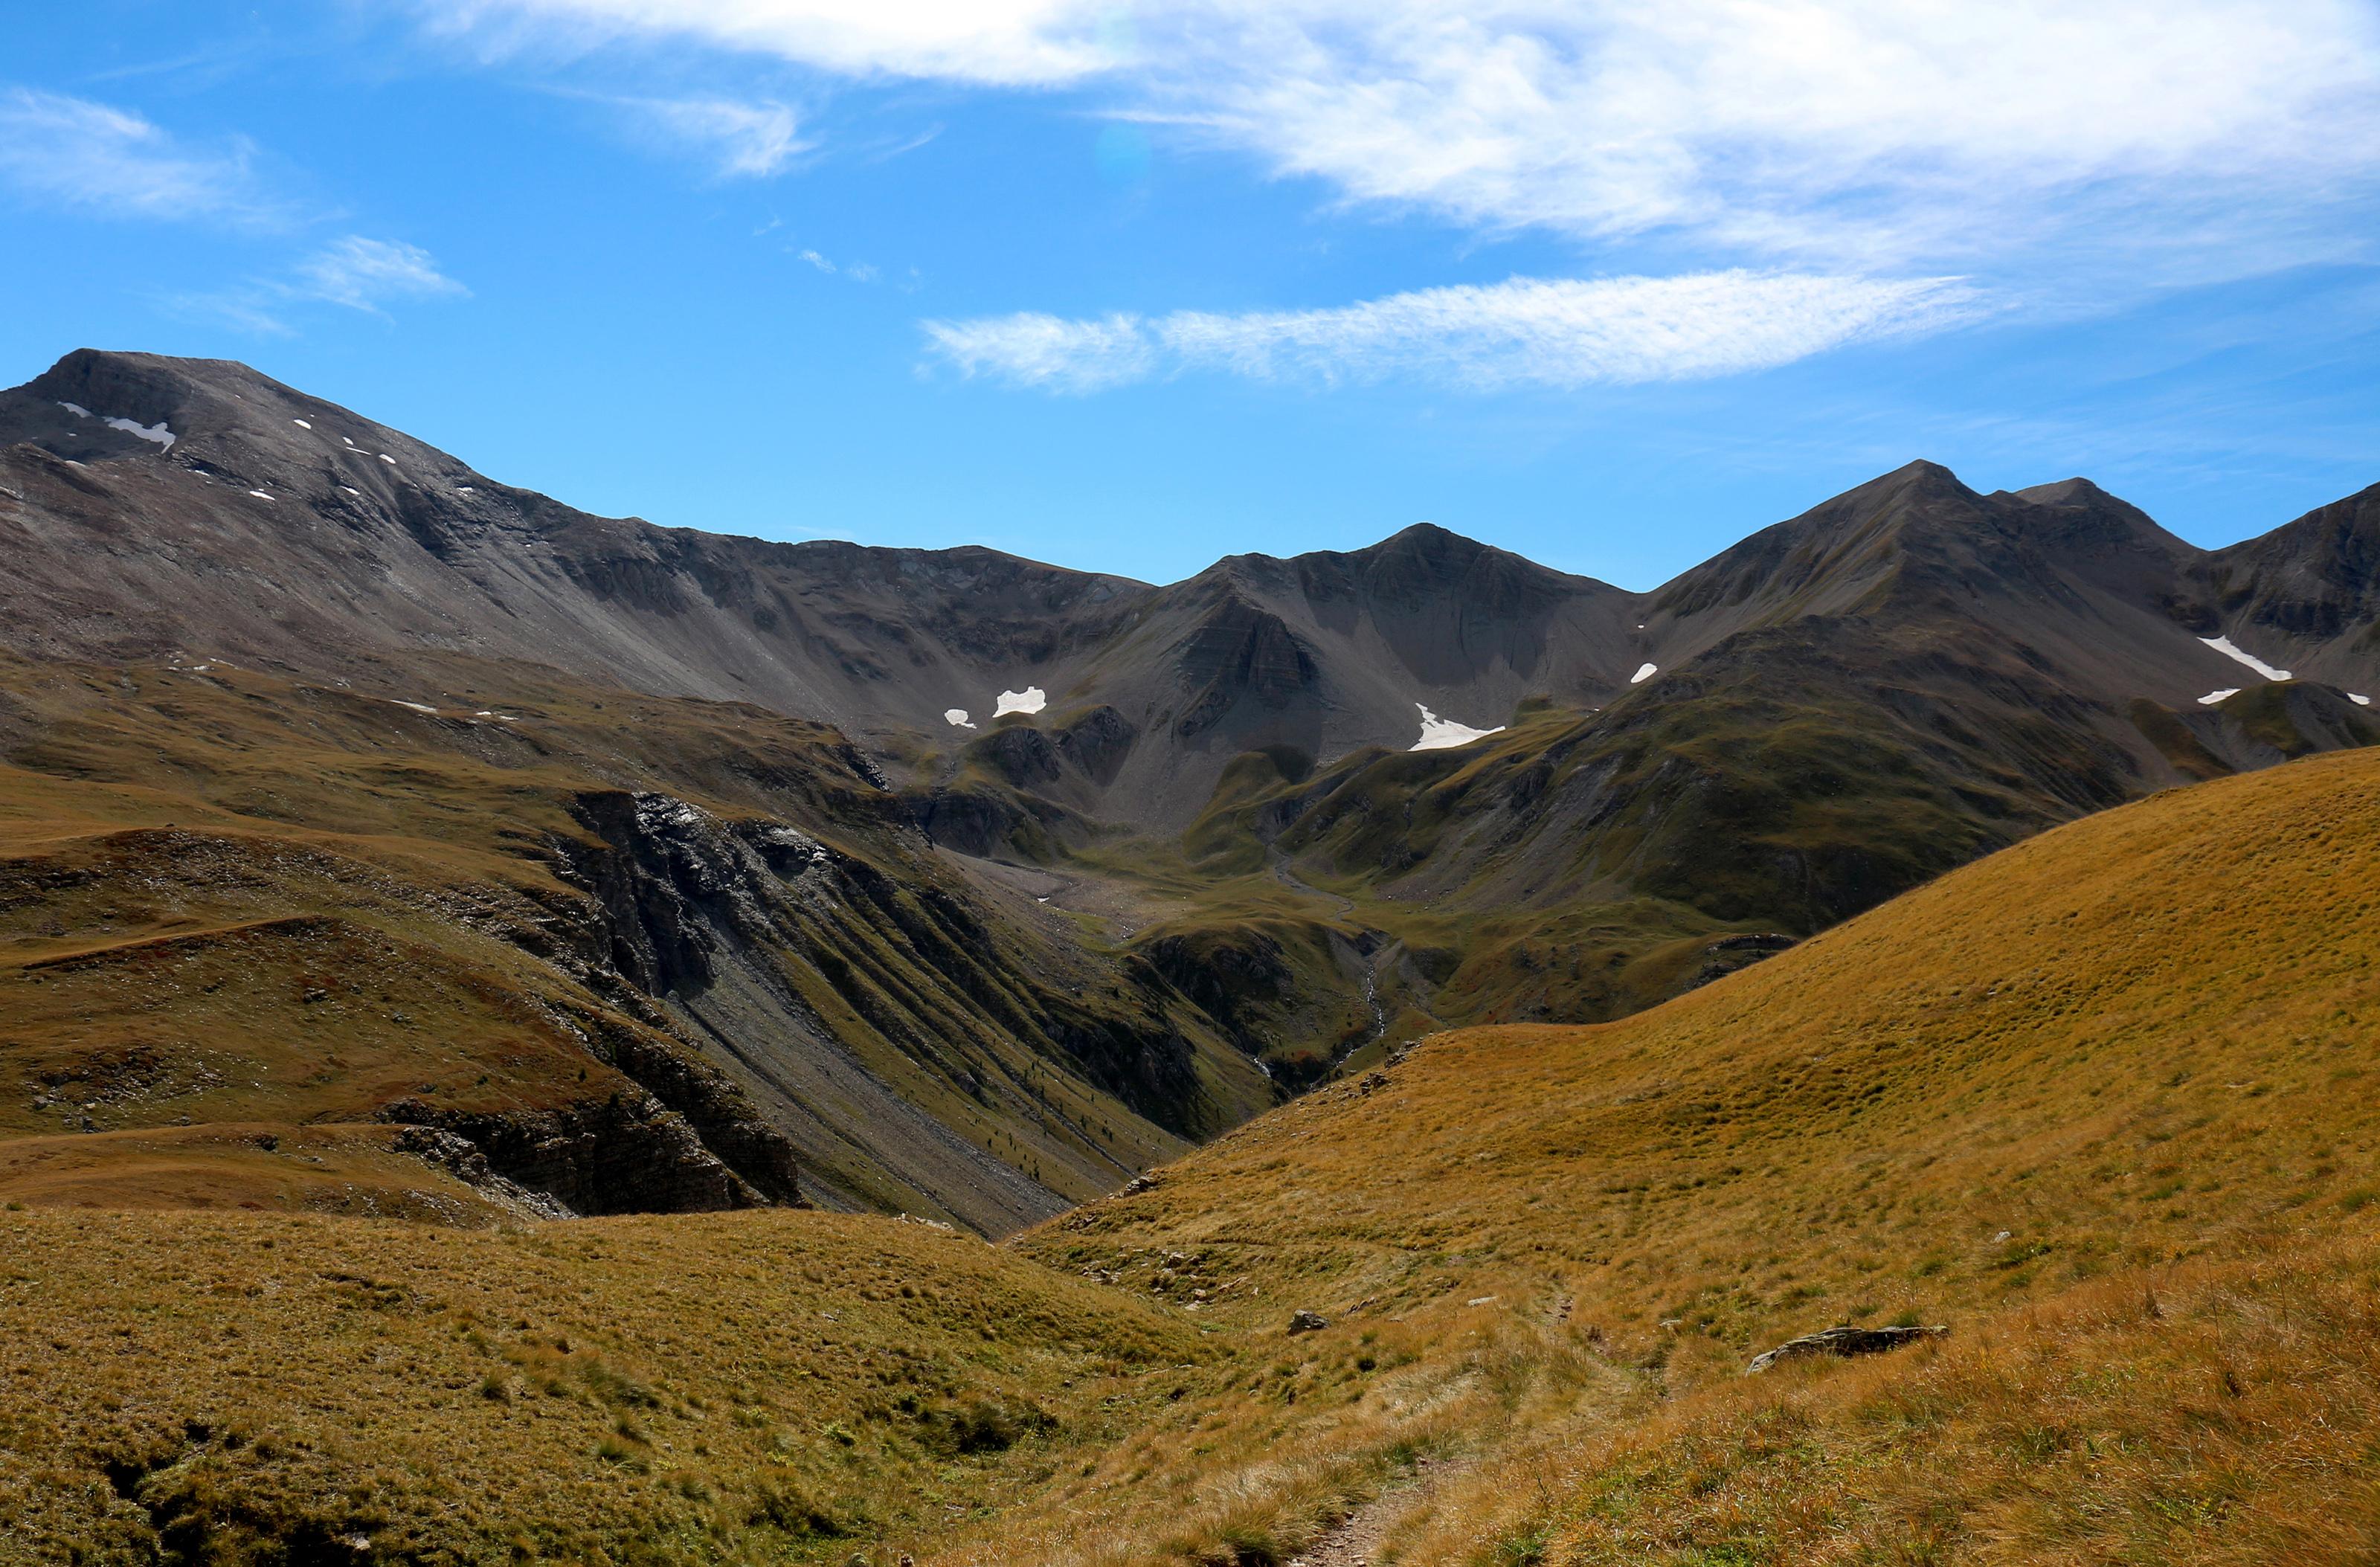 Mountain 338 - paradisiac place by Momotte2stocks